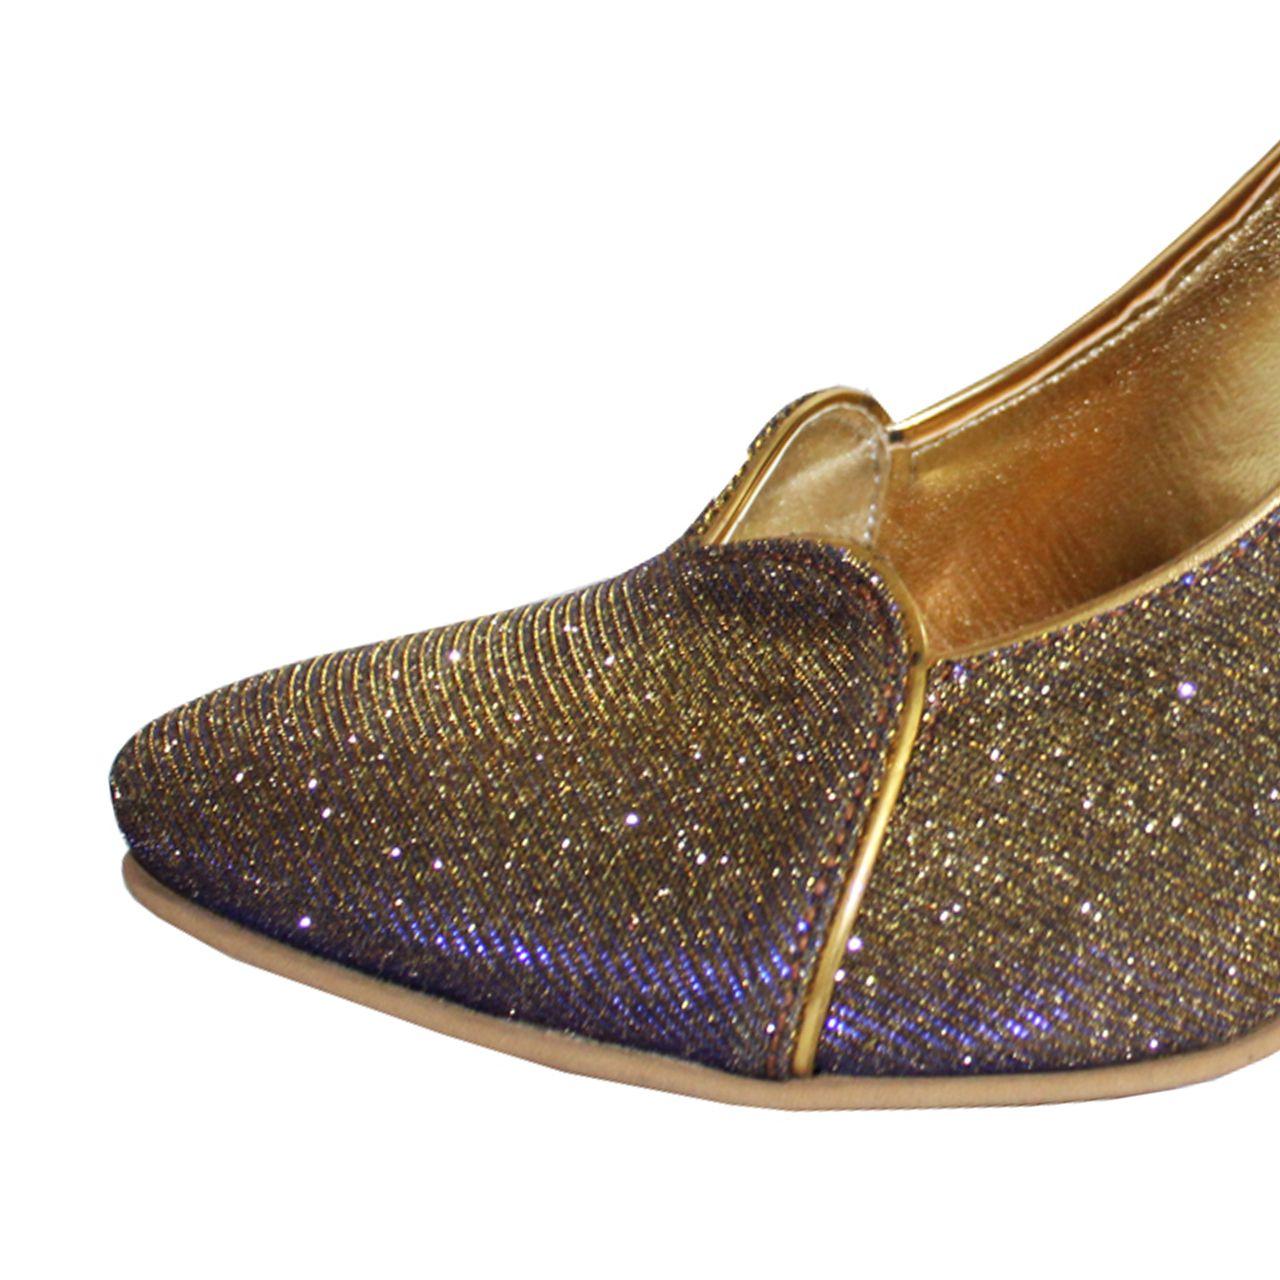 کفش زنانه کد 111 -  - 3